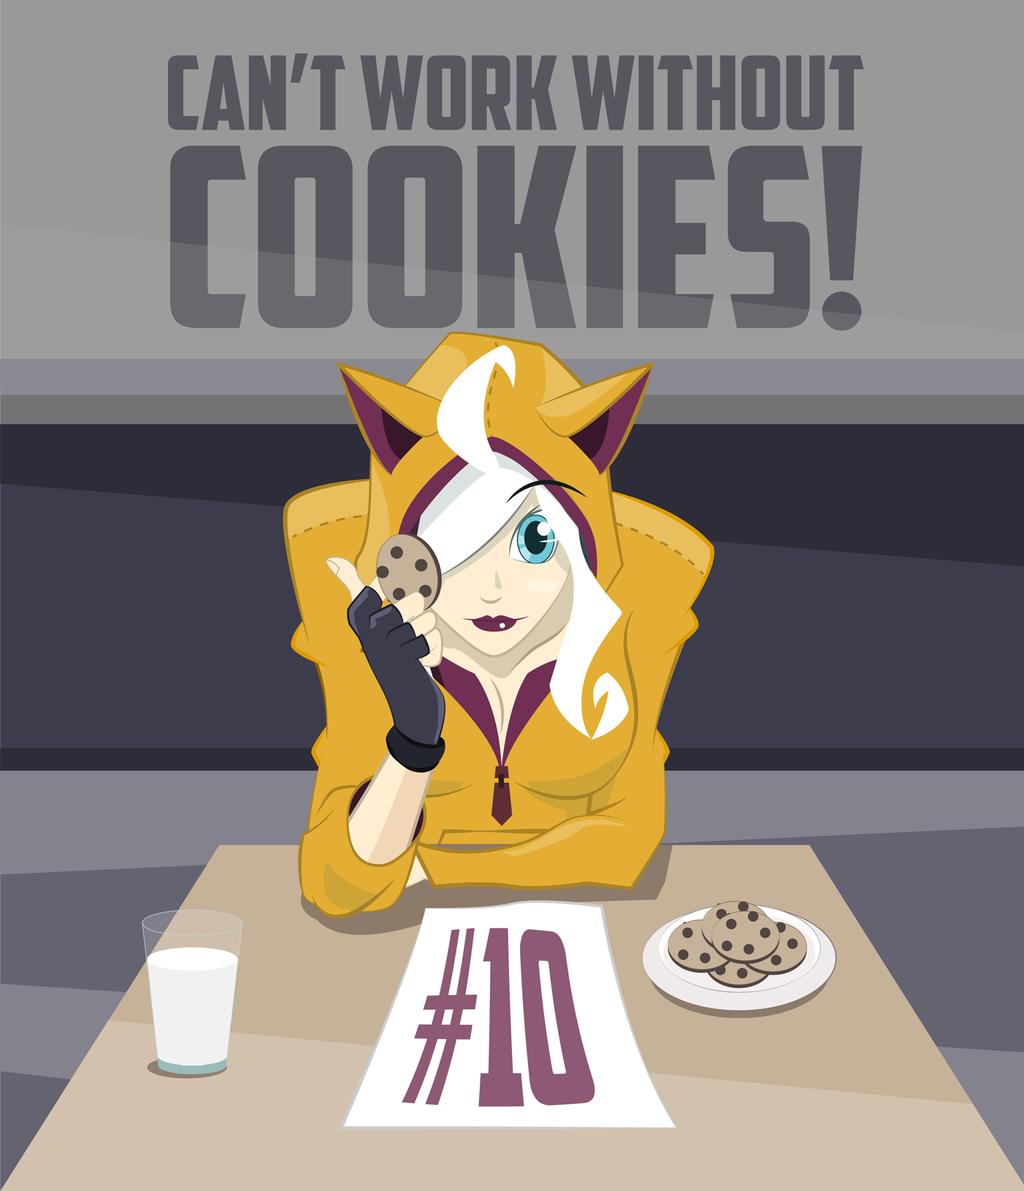 alex meintjes characters illustrations